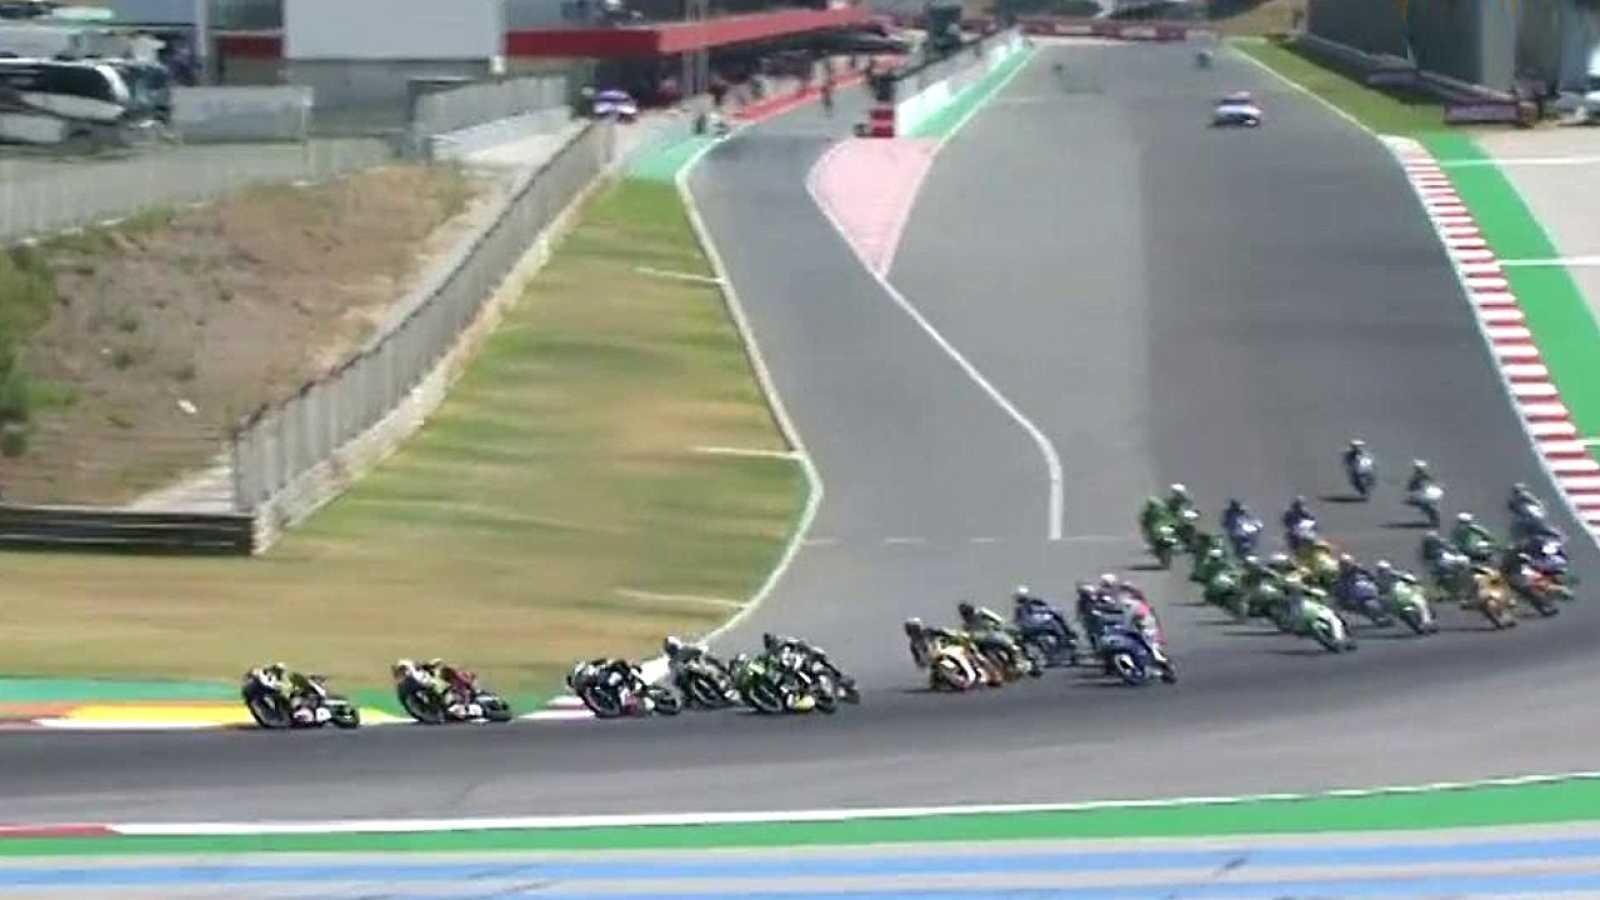 Motociclismo - Campeonato del Mundo Superbike 2020. Prueba Portugal: World Supersport 300 2ª carrera, desde Portimao (Portugal) - ver ahora